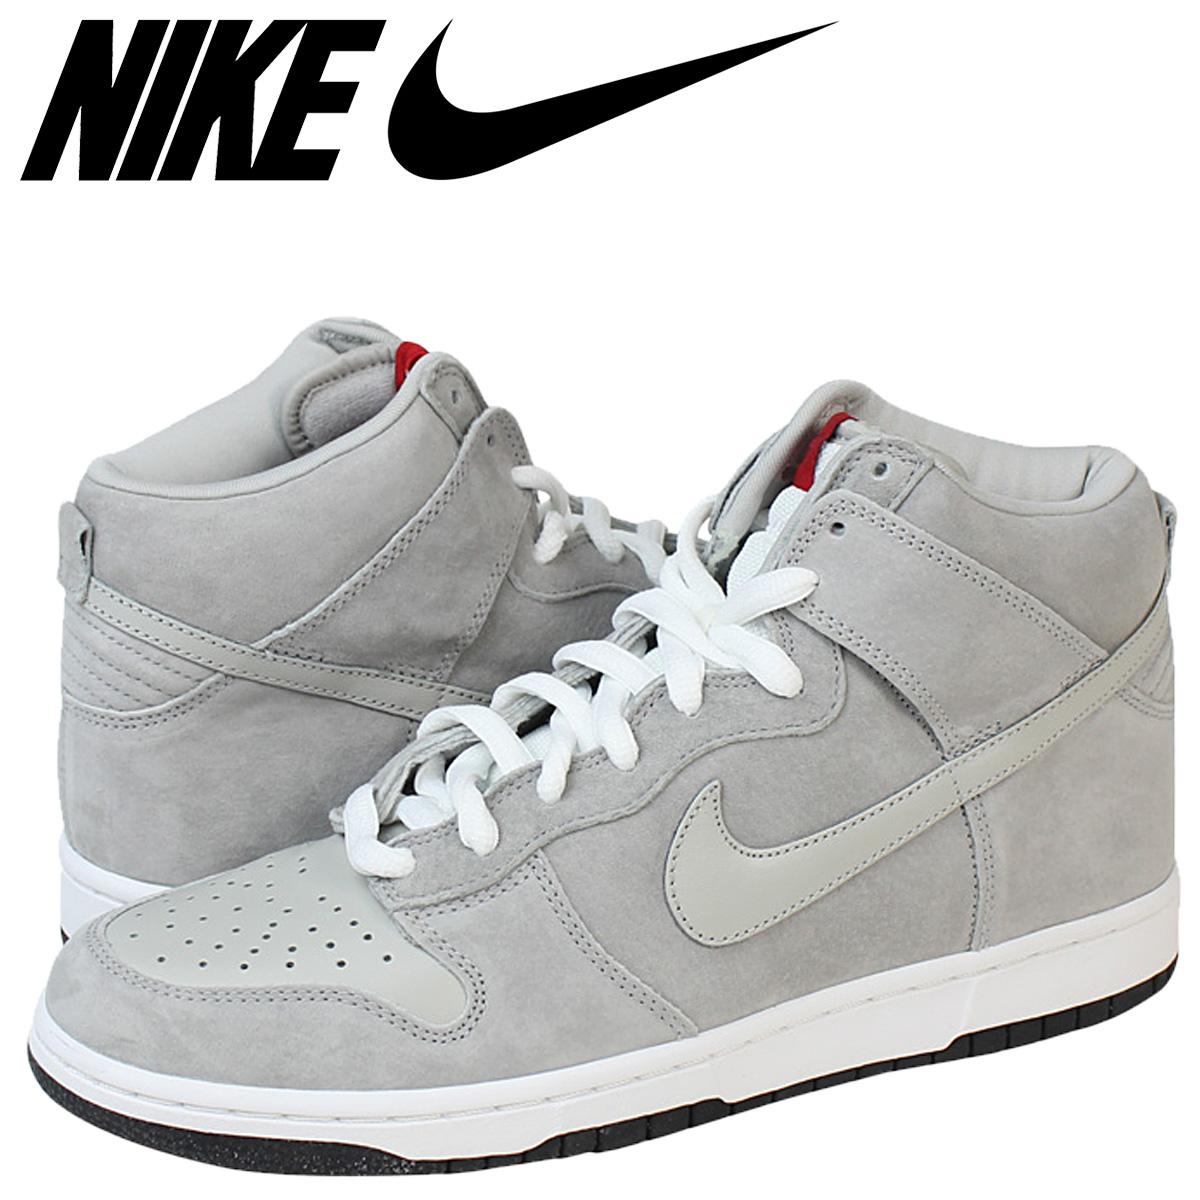 promo code 93b21 f4d02 Nike NIKE dunk sneakers DUNK HIGH SB PEE-WEE dunk high SB 305,050-004 gray  men